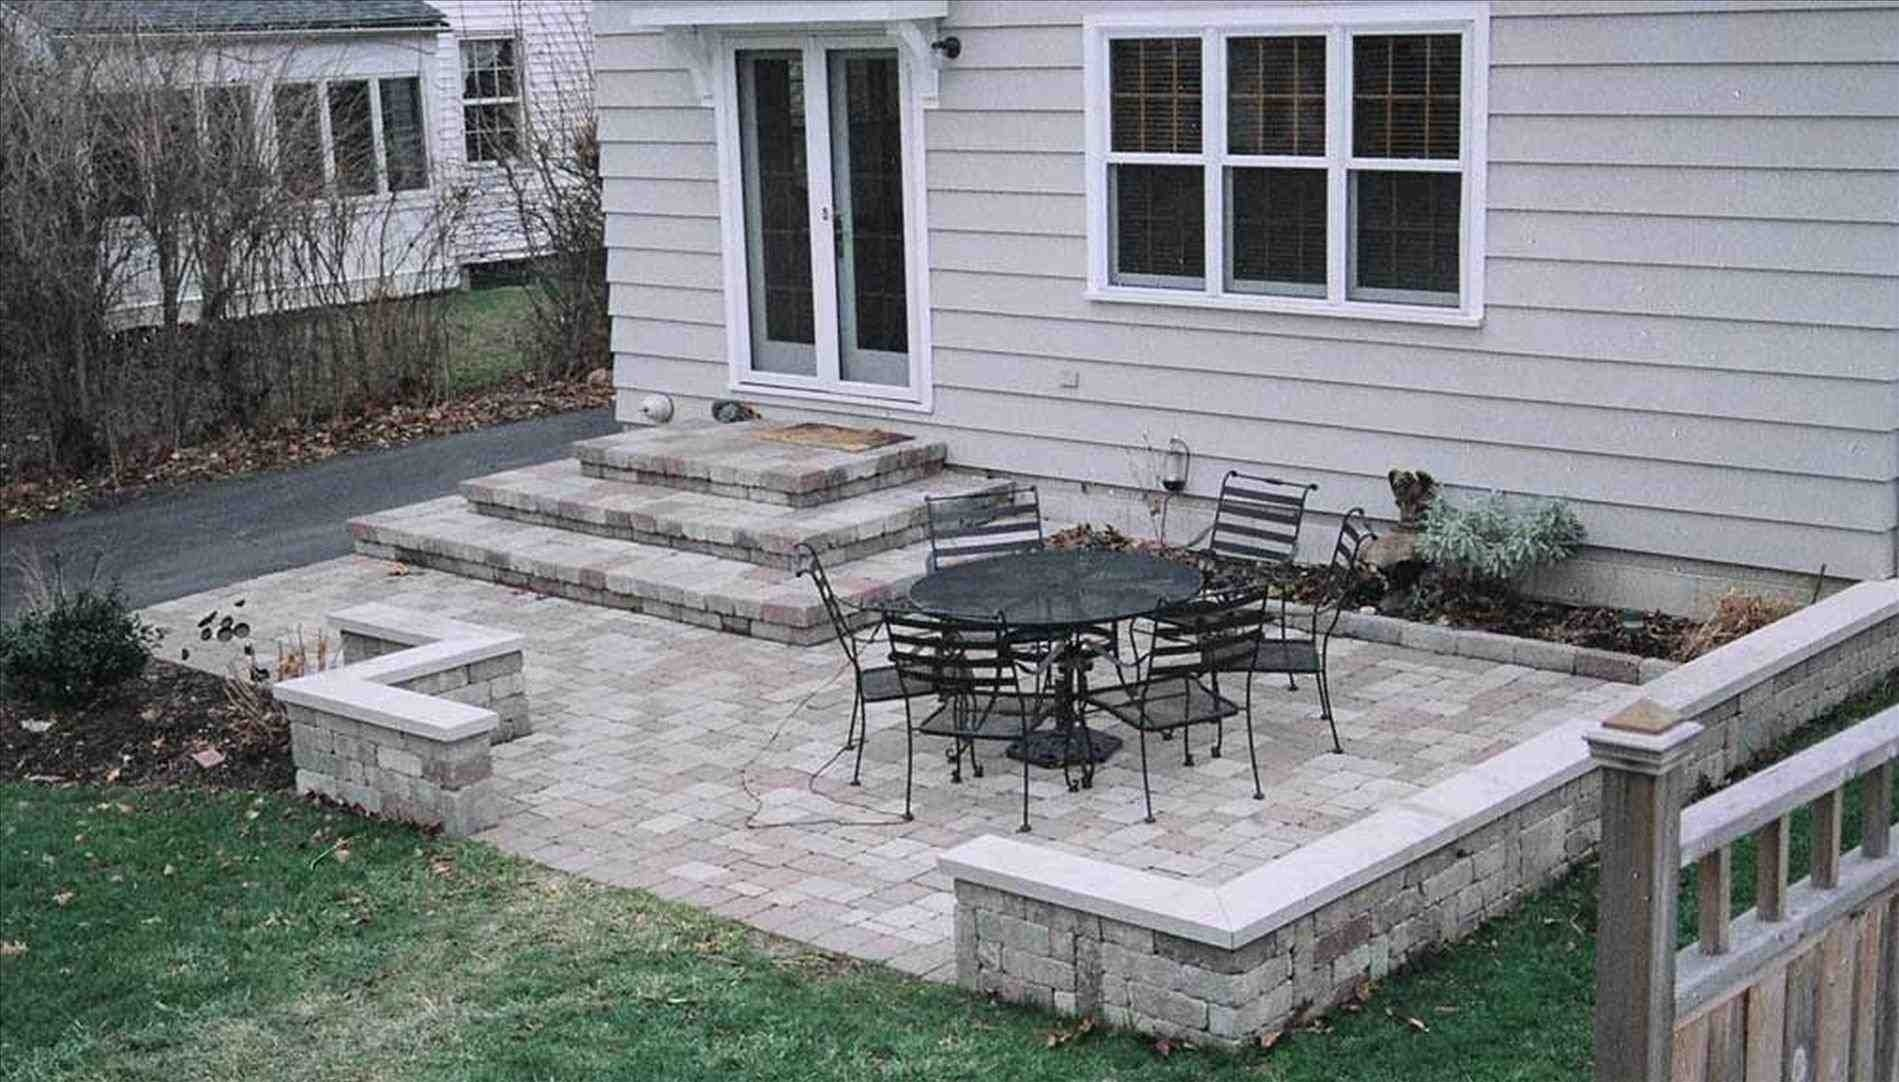 10 Best Concrete Patio Ideas For Small Backyards small backyard concrete patio ideas homedesignlatest site